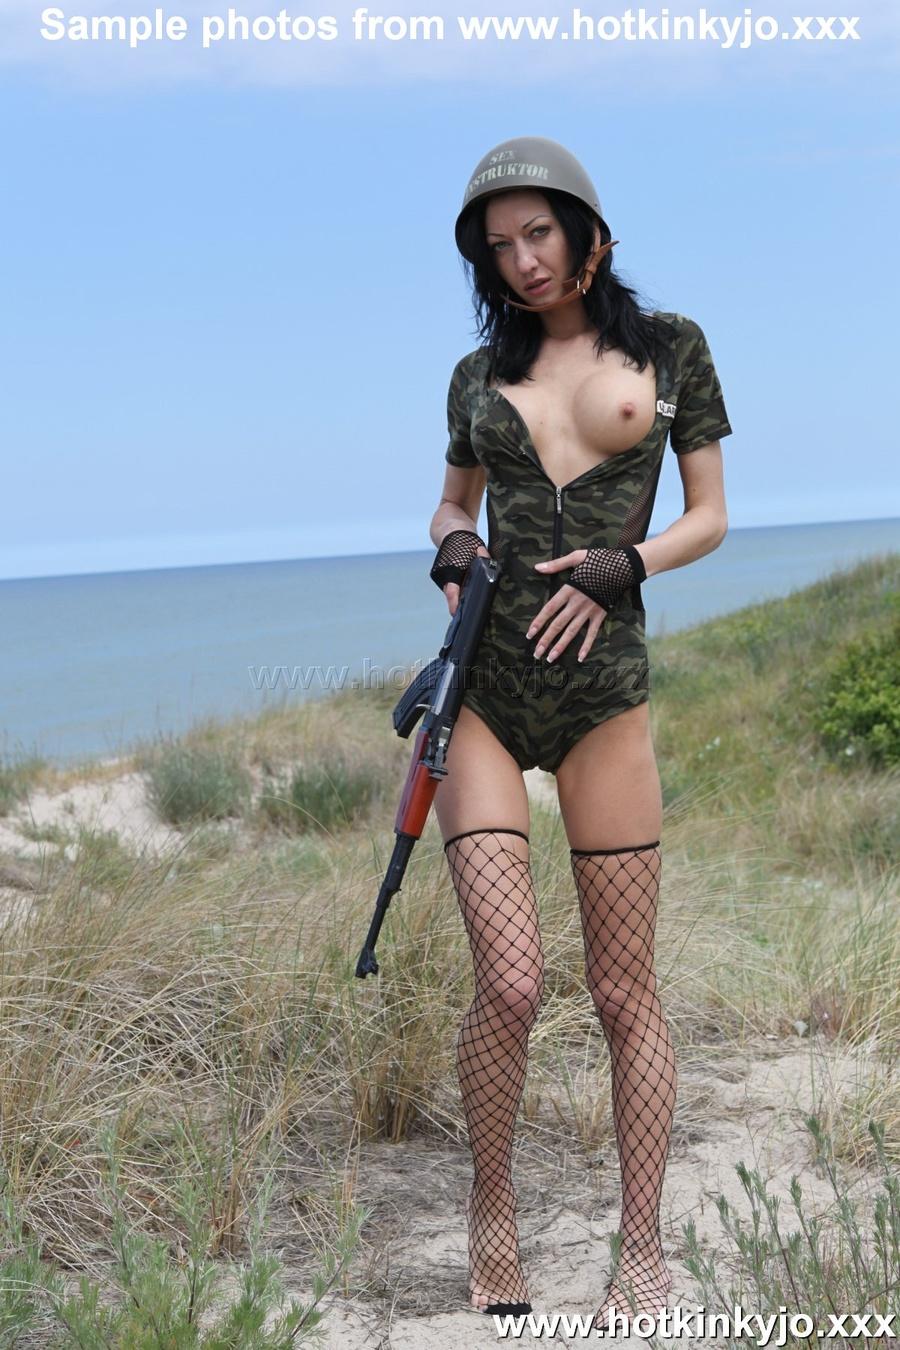 Perfect Boobs Dark Haired Girl In Military - Xxx Dessert -3050